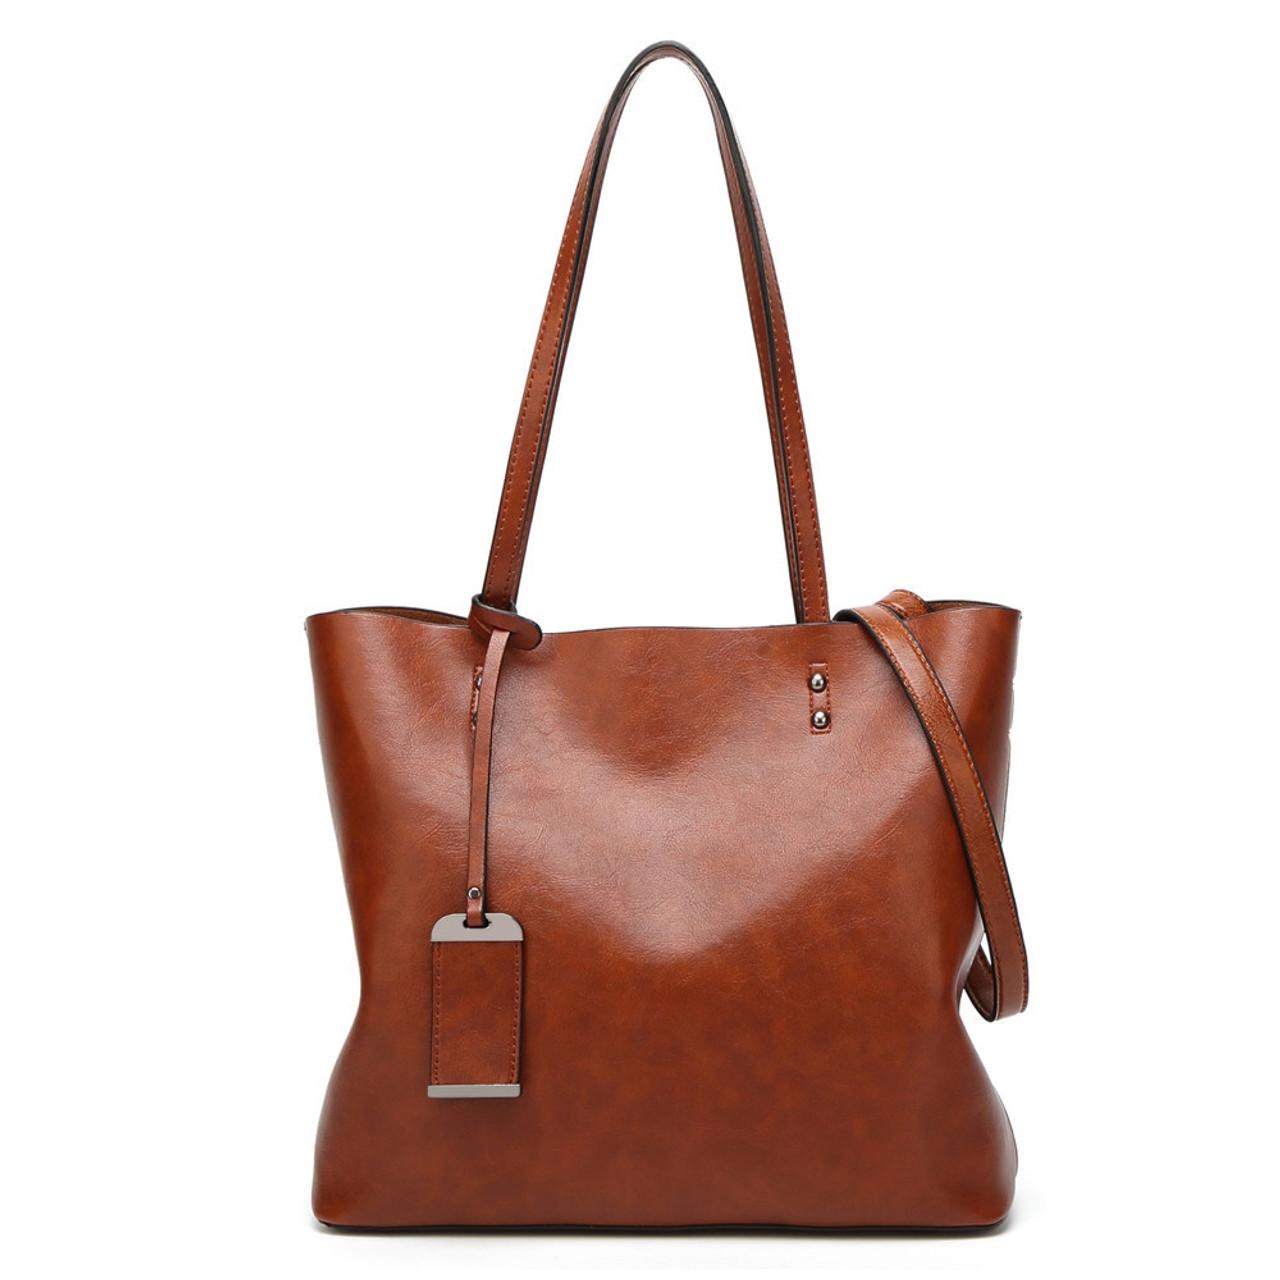 0db6ec10e71 ... GORONLY Brand New Leather Tote Bag Women Handbags Designer Large  Capacity Shoulder Bags Fashion Lady Purses ...